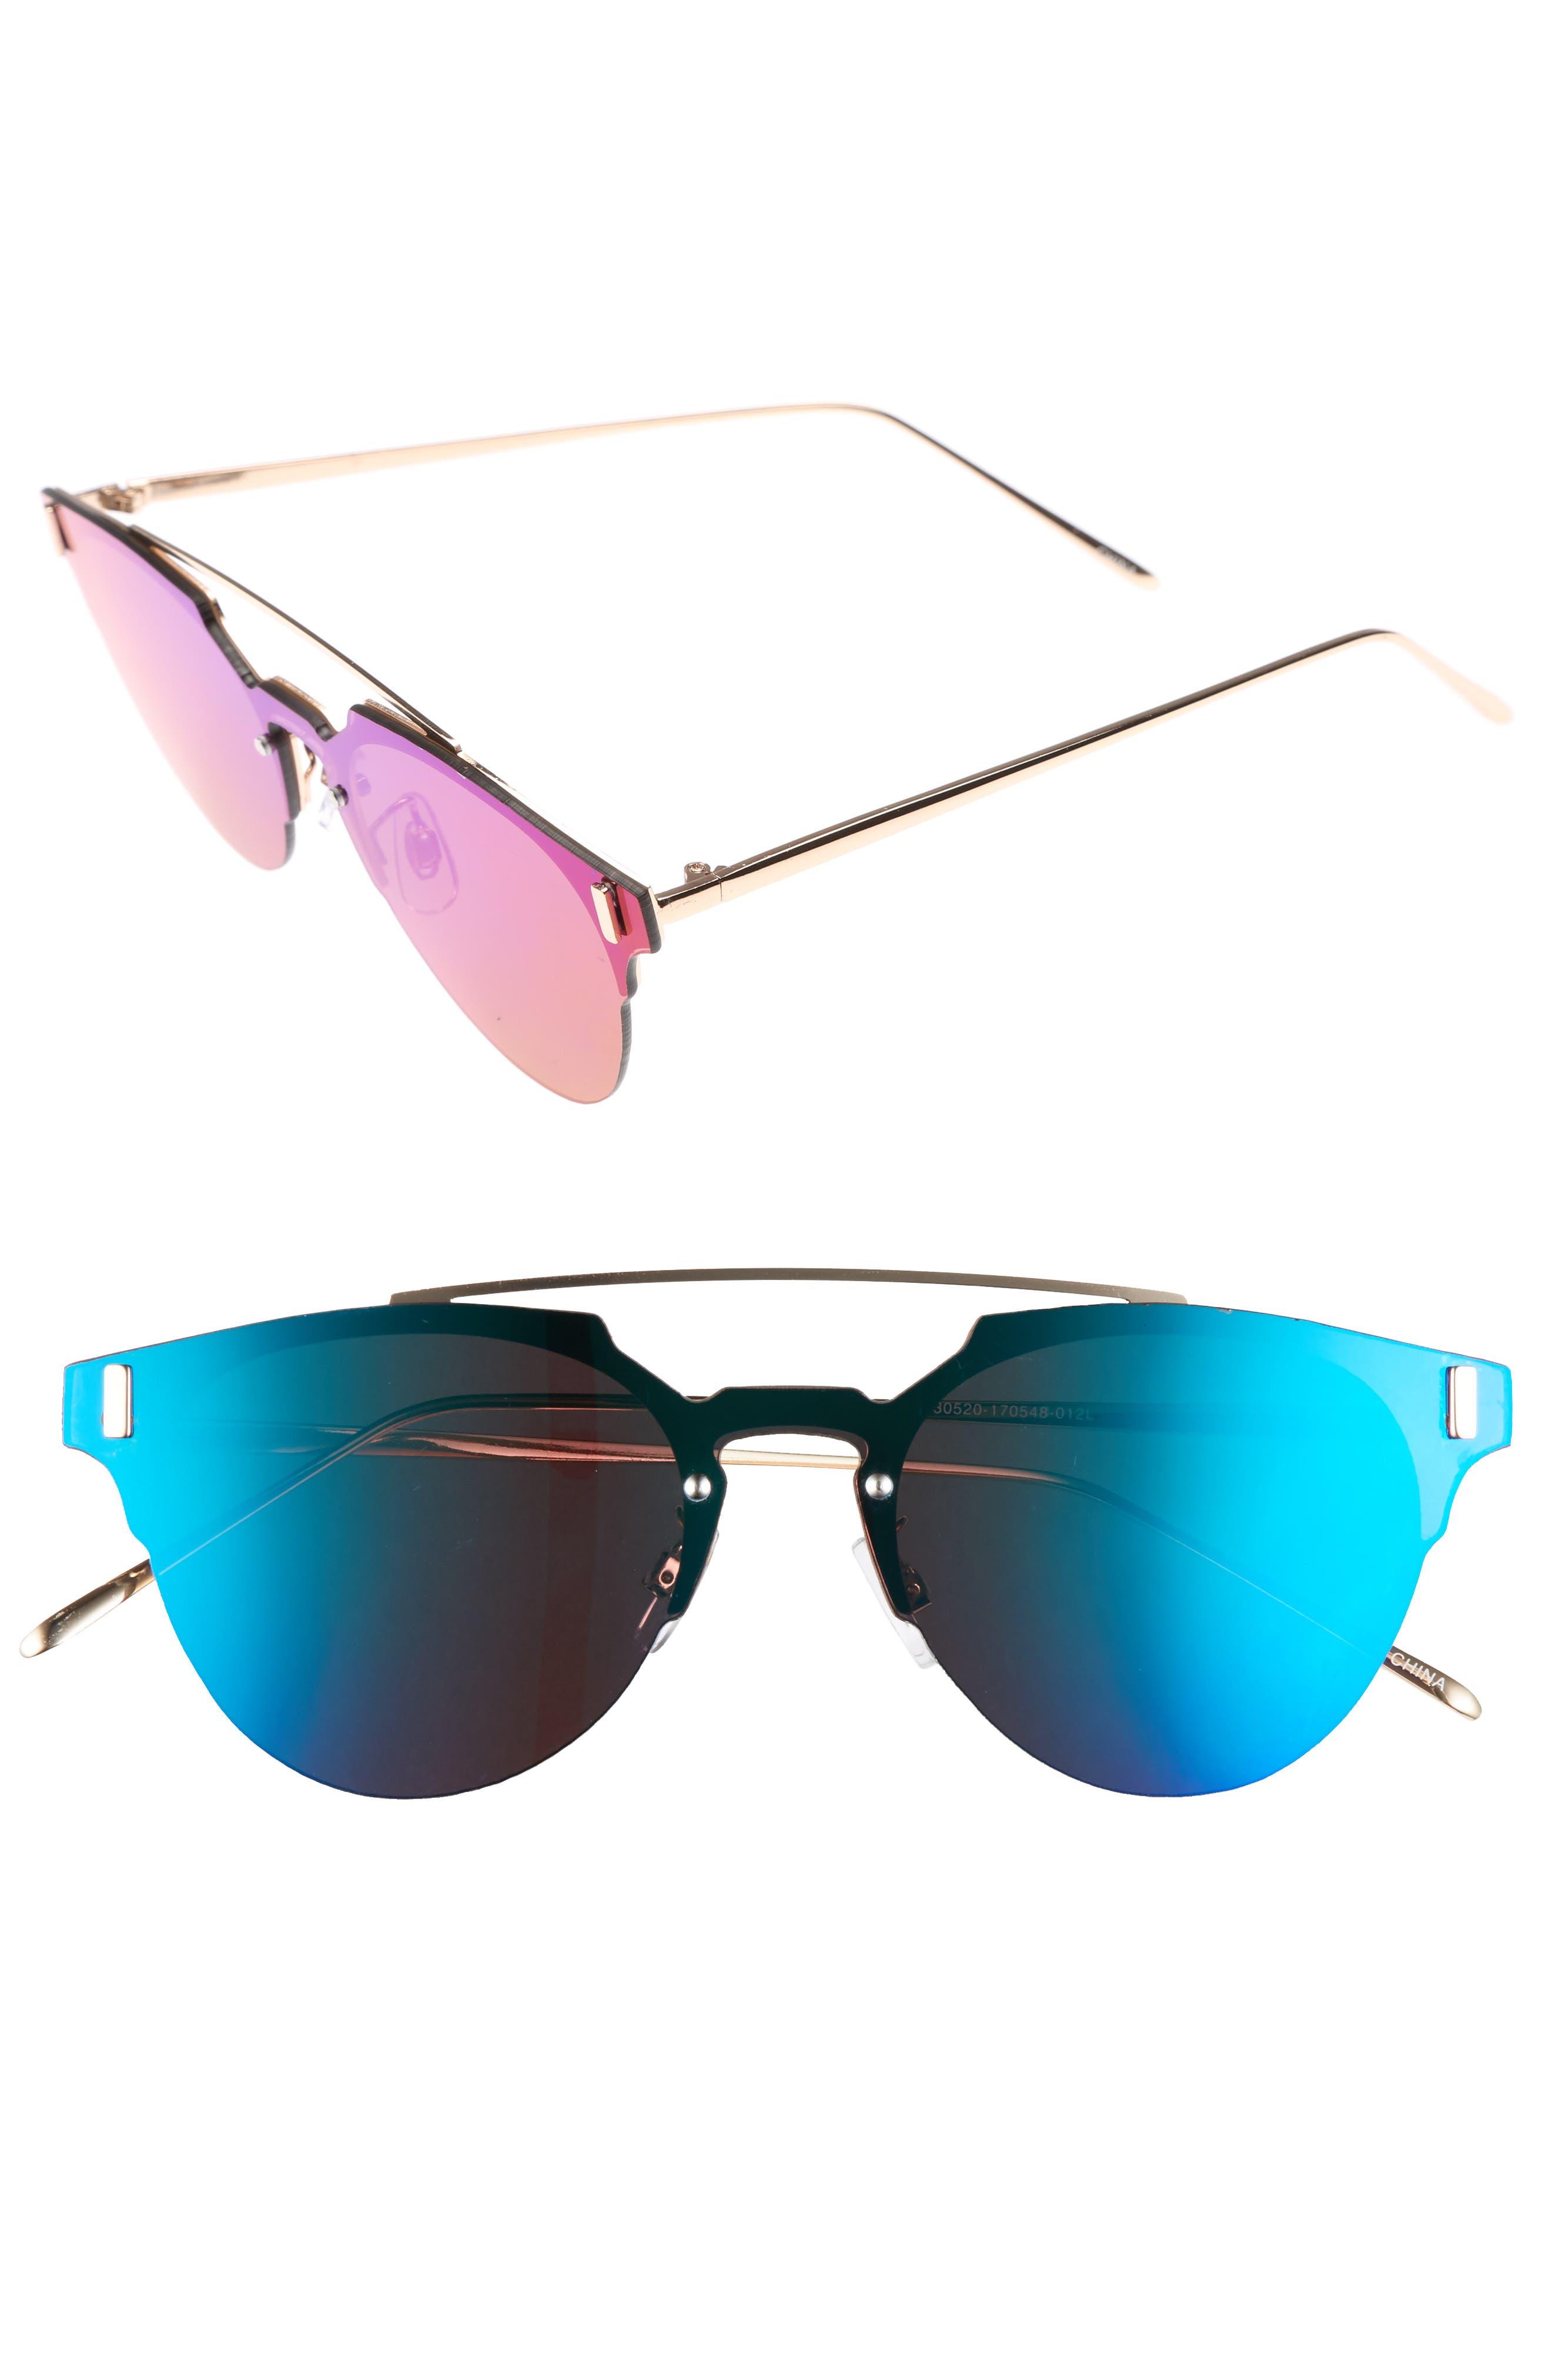 50mm Mirrored Round Sunglasses,                         Main,                         color, 400